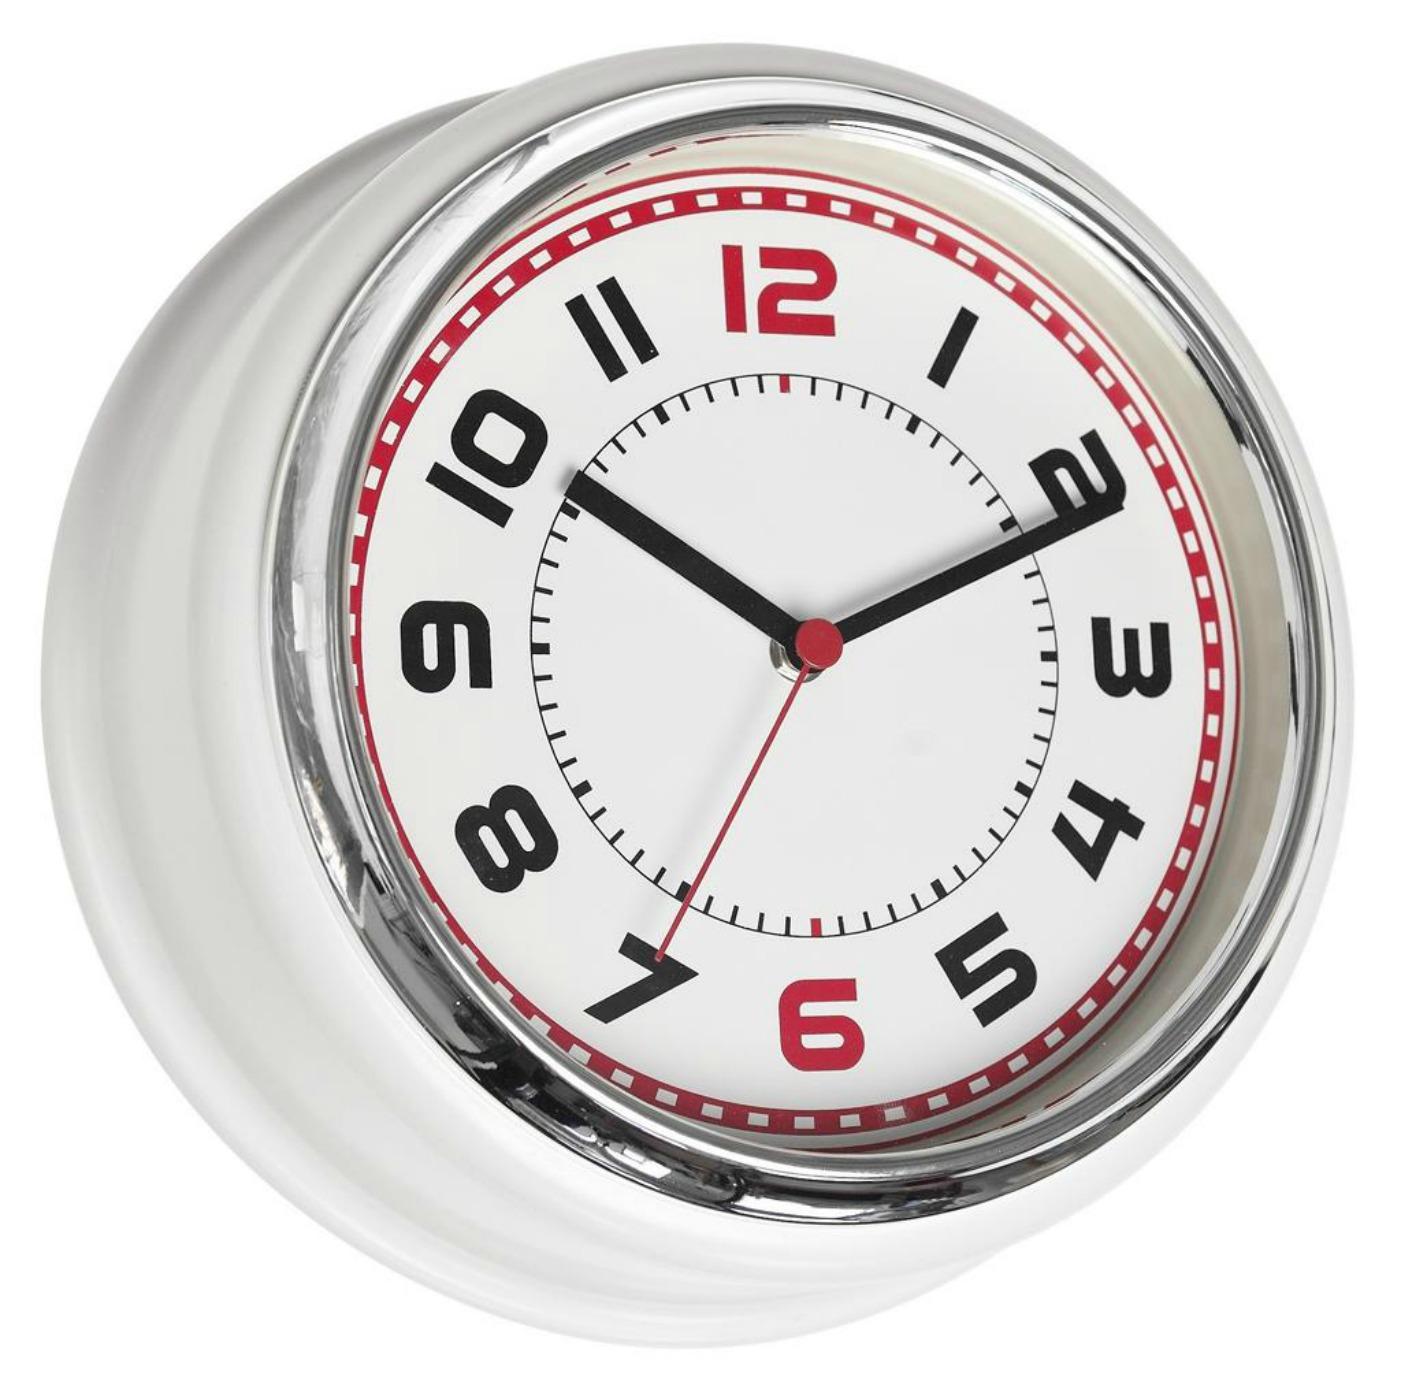 retro kitchen wall clock faucets stainless steel ستايلات ساعات للمطبخ مميزة ورائعة المرسال